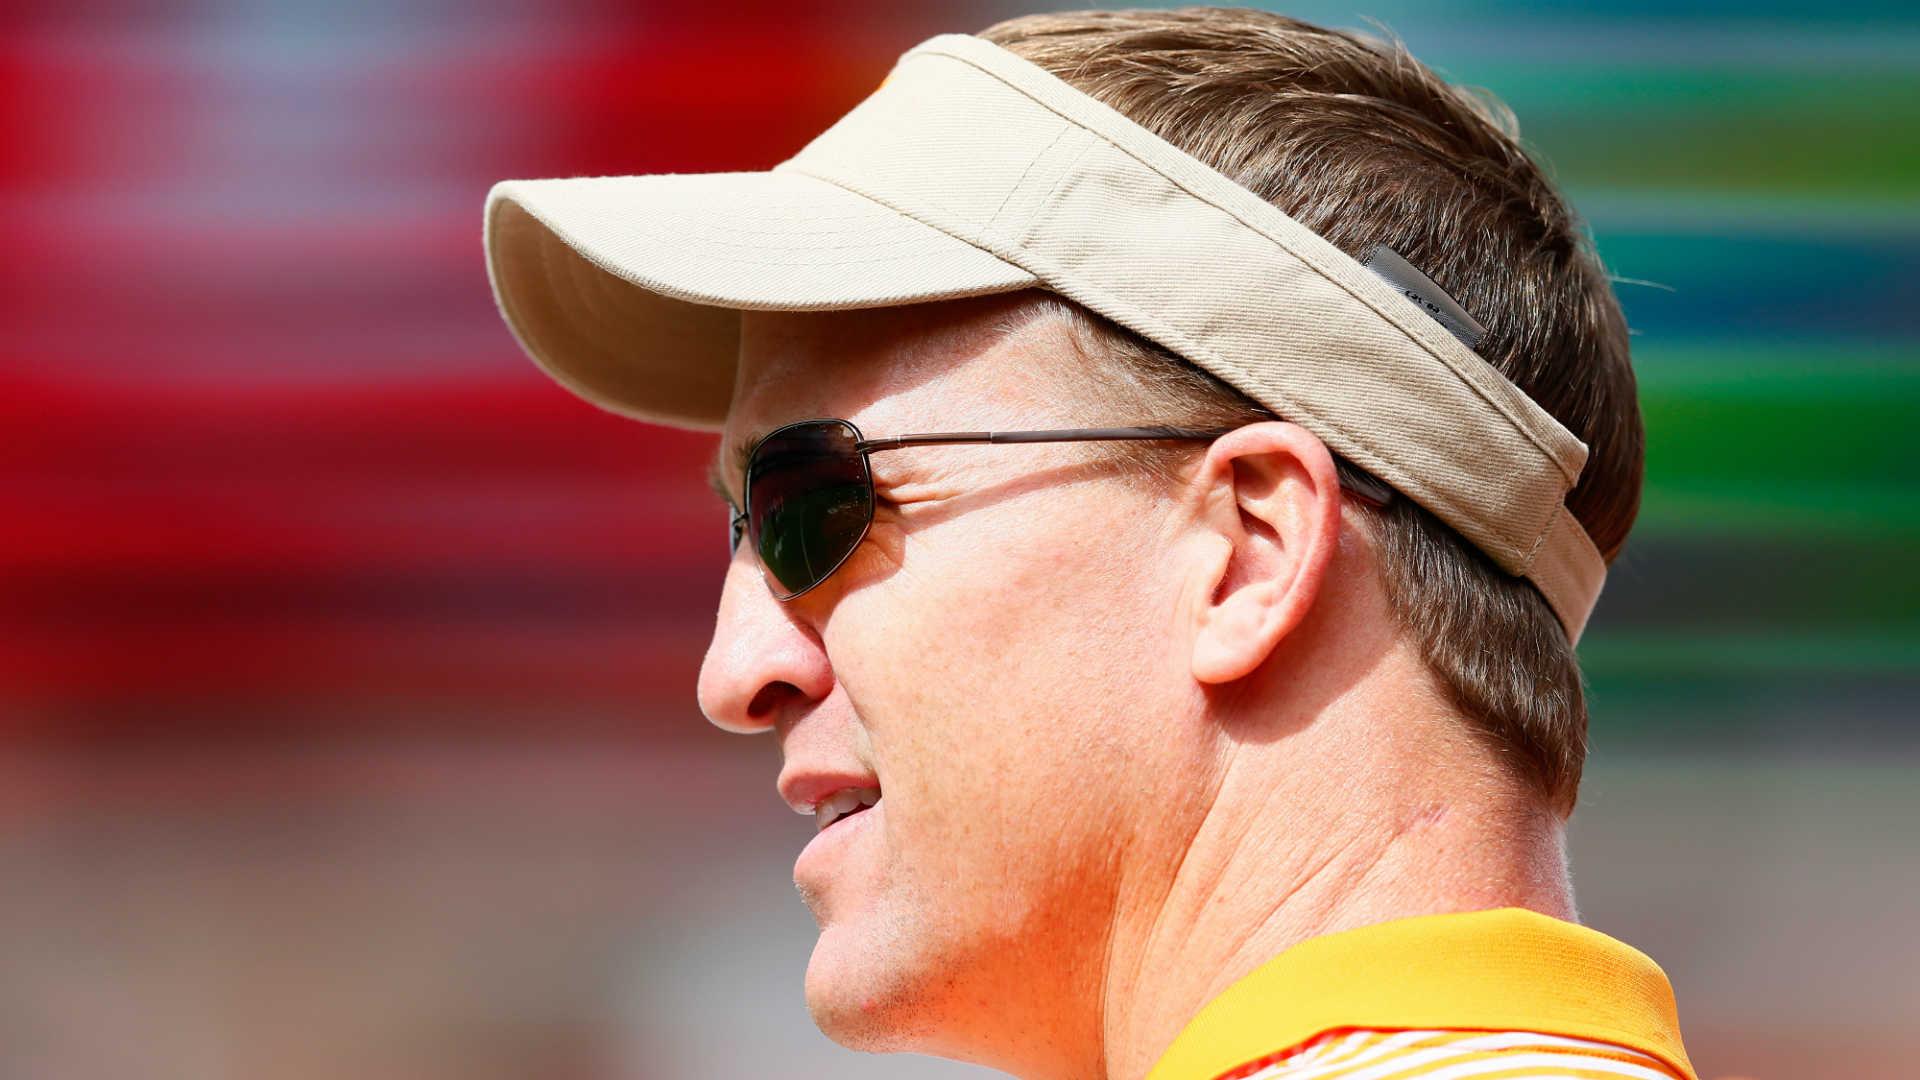 Peyton-Manning-032216-Getty-FTR.jpg